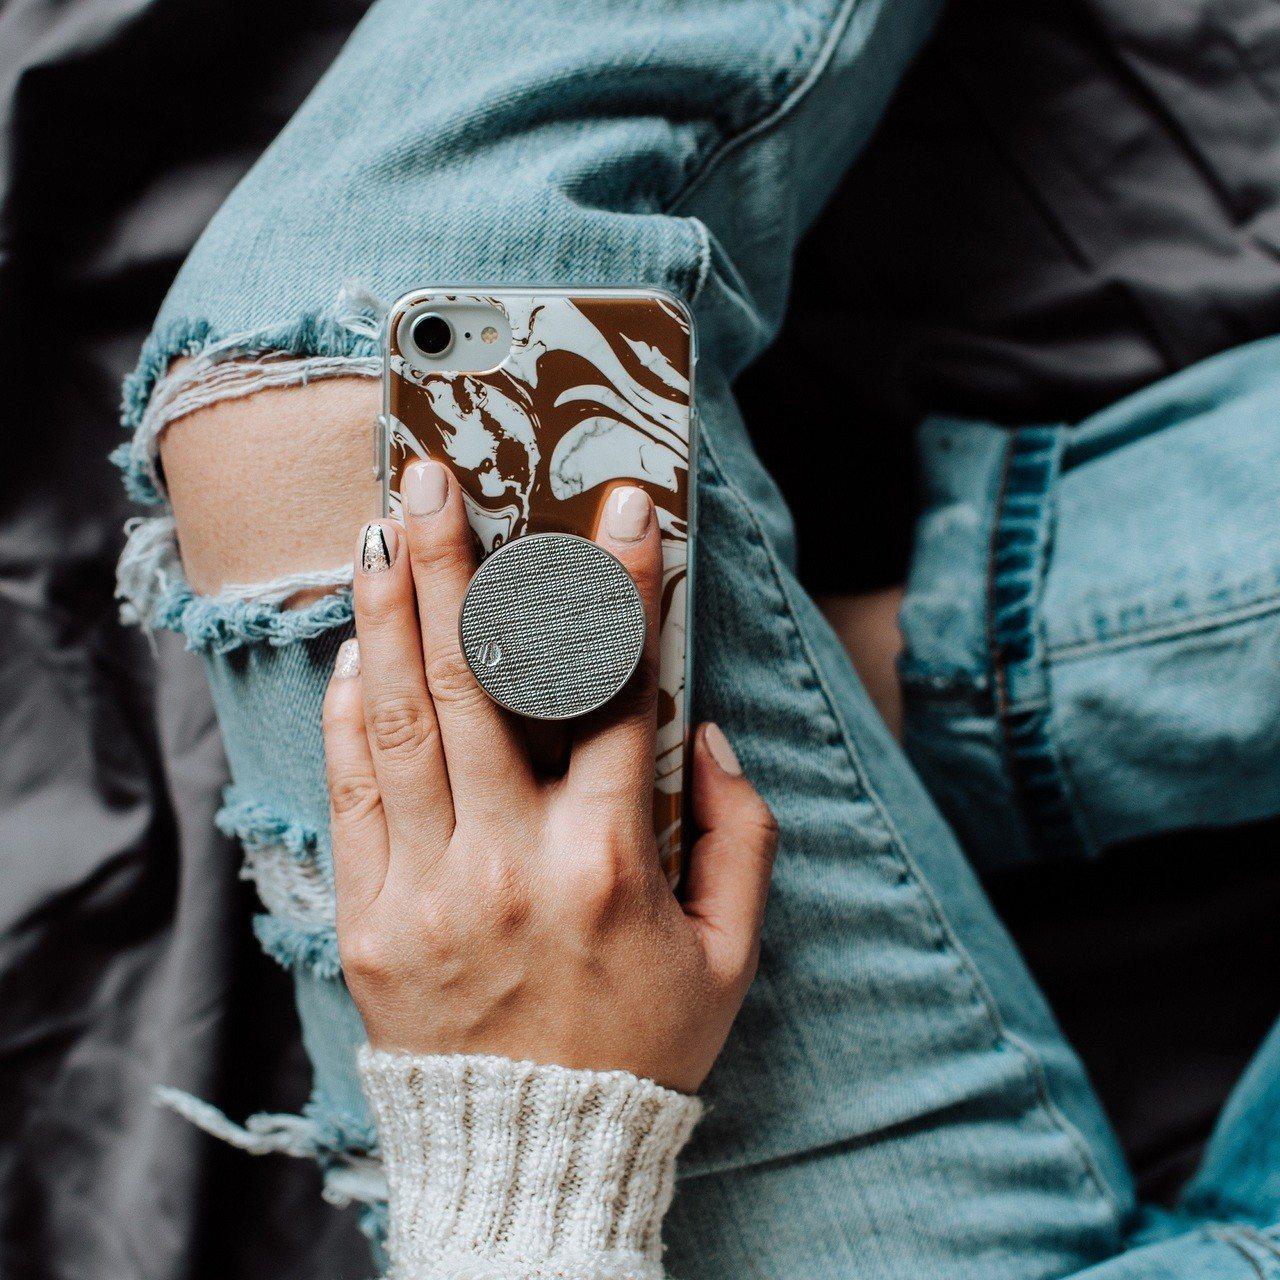 SAFFIANO壓紋皮革系列共有太空銀、玫瑰金、香檳金3款,時尚百搭。圖/P...